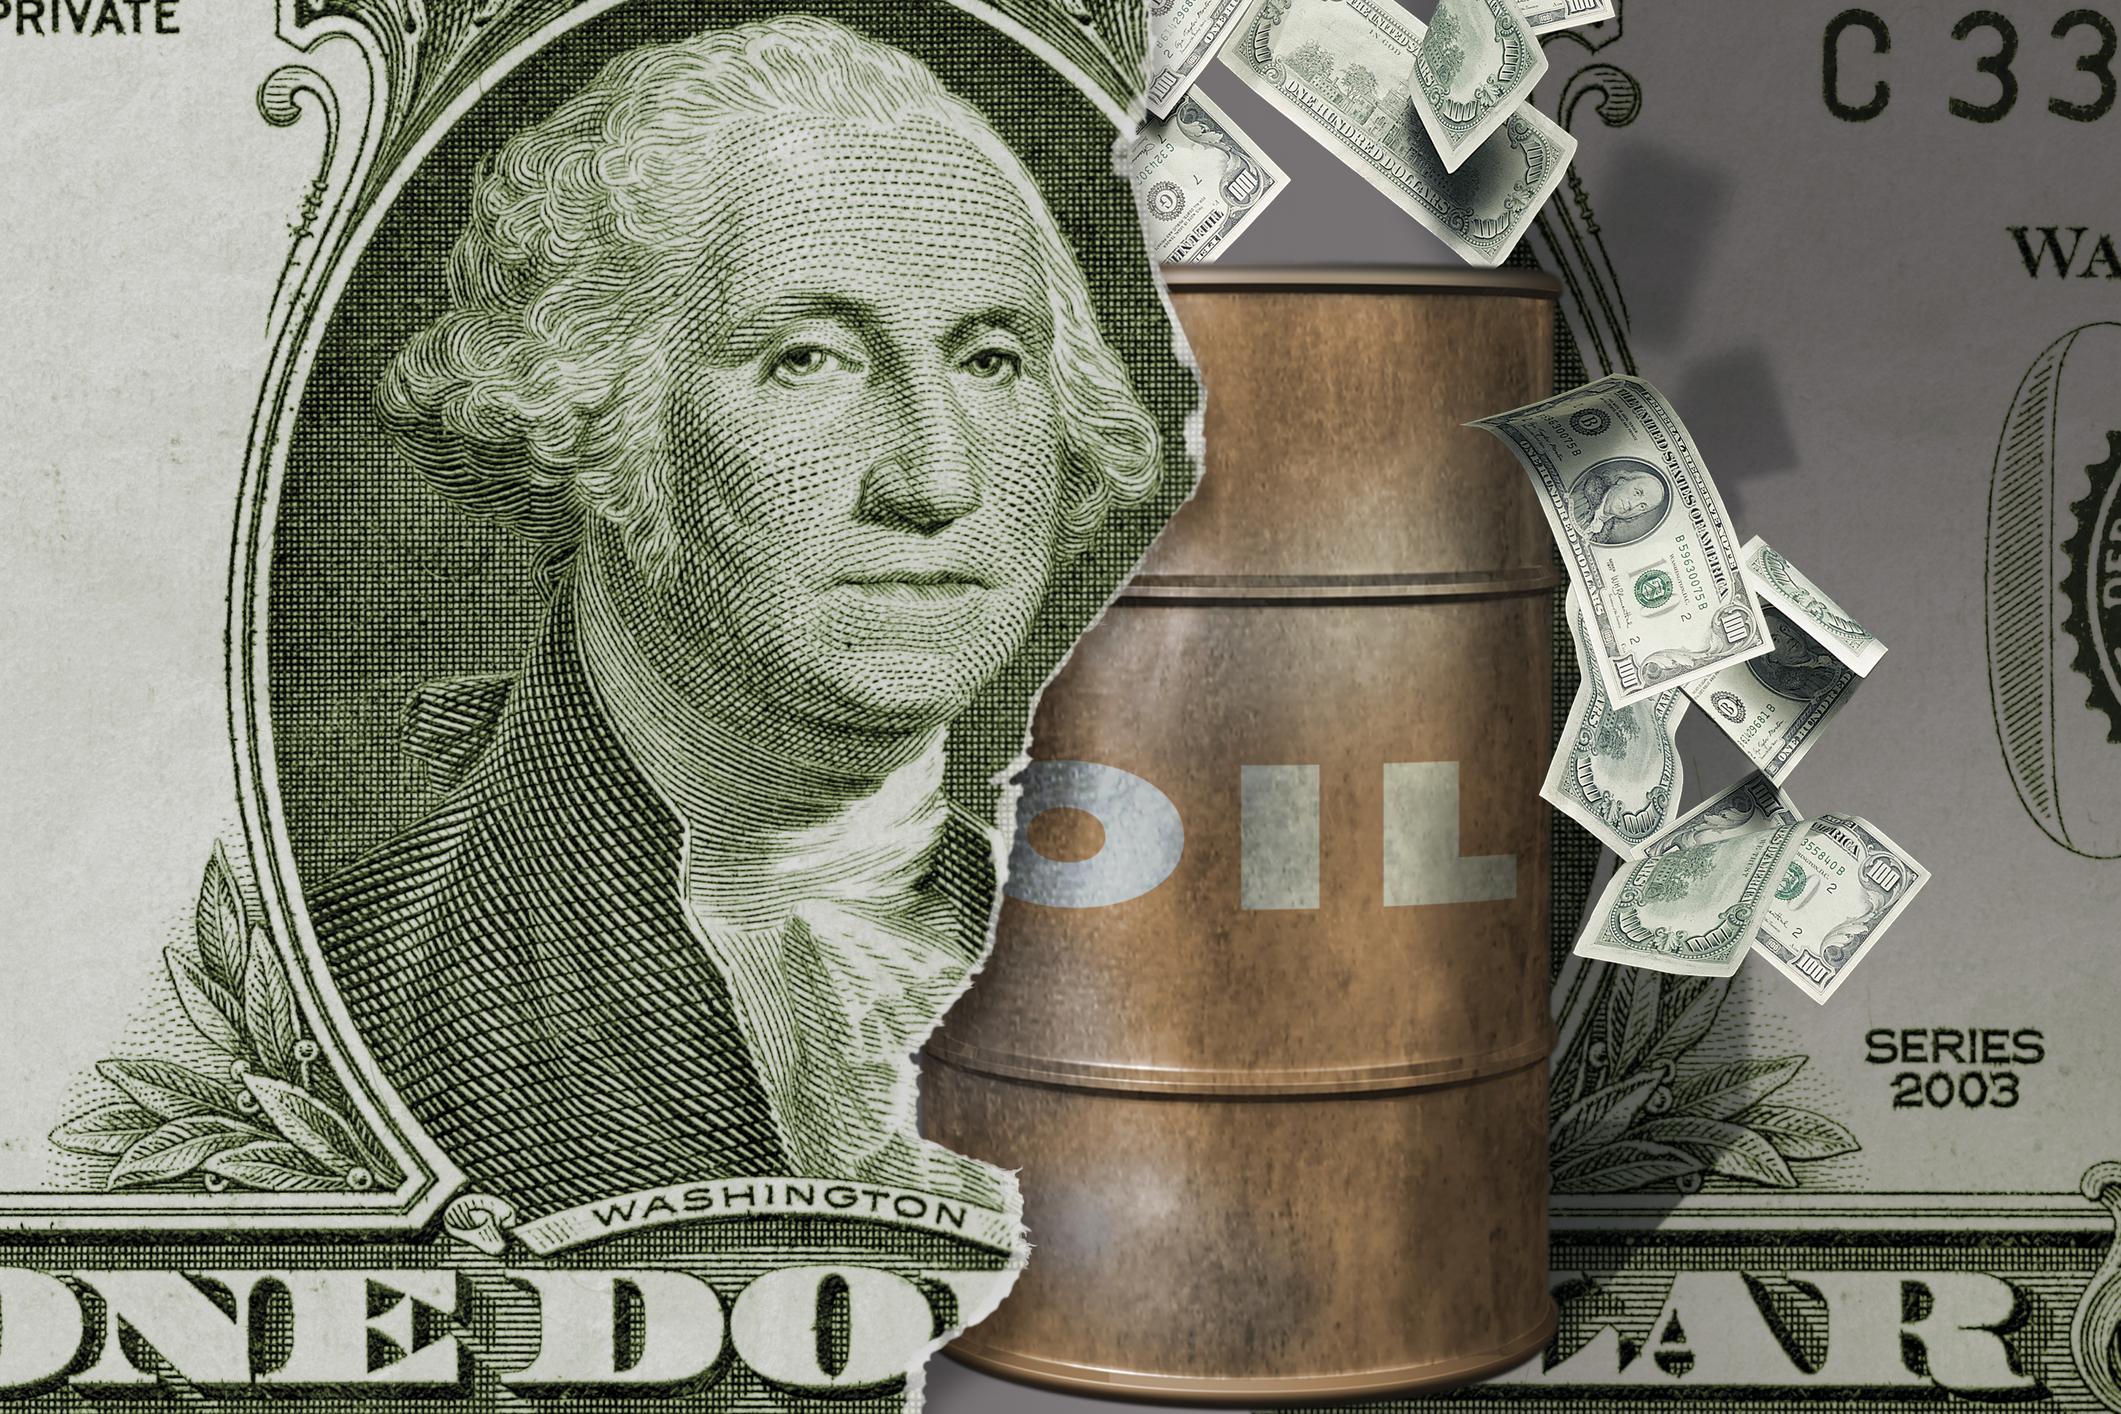 A barrel of oil coming through a dollar bill.